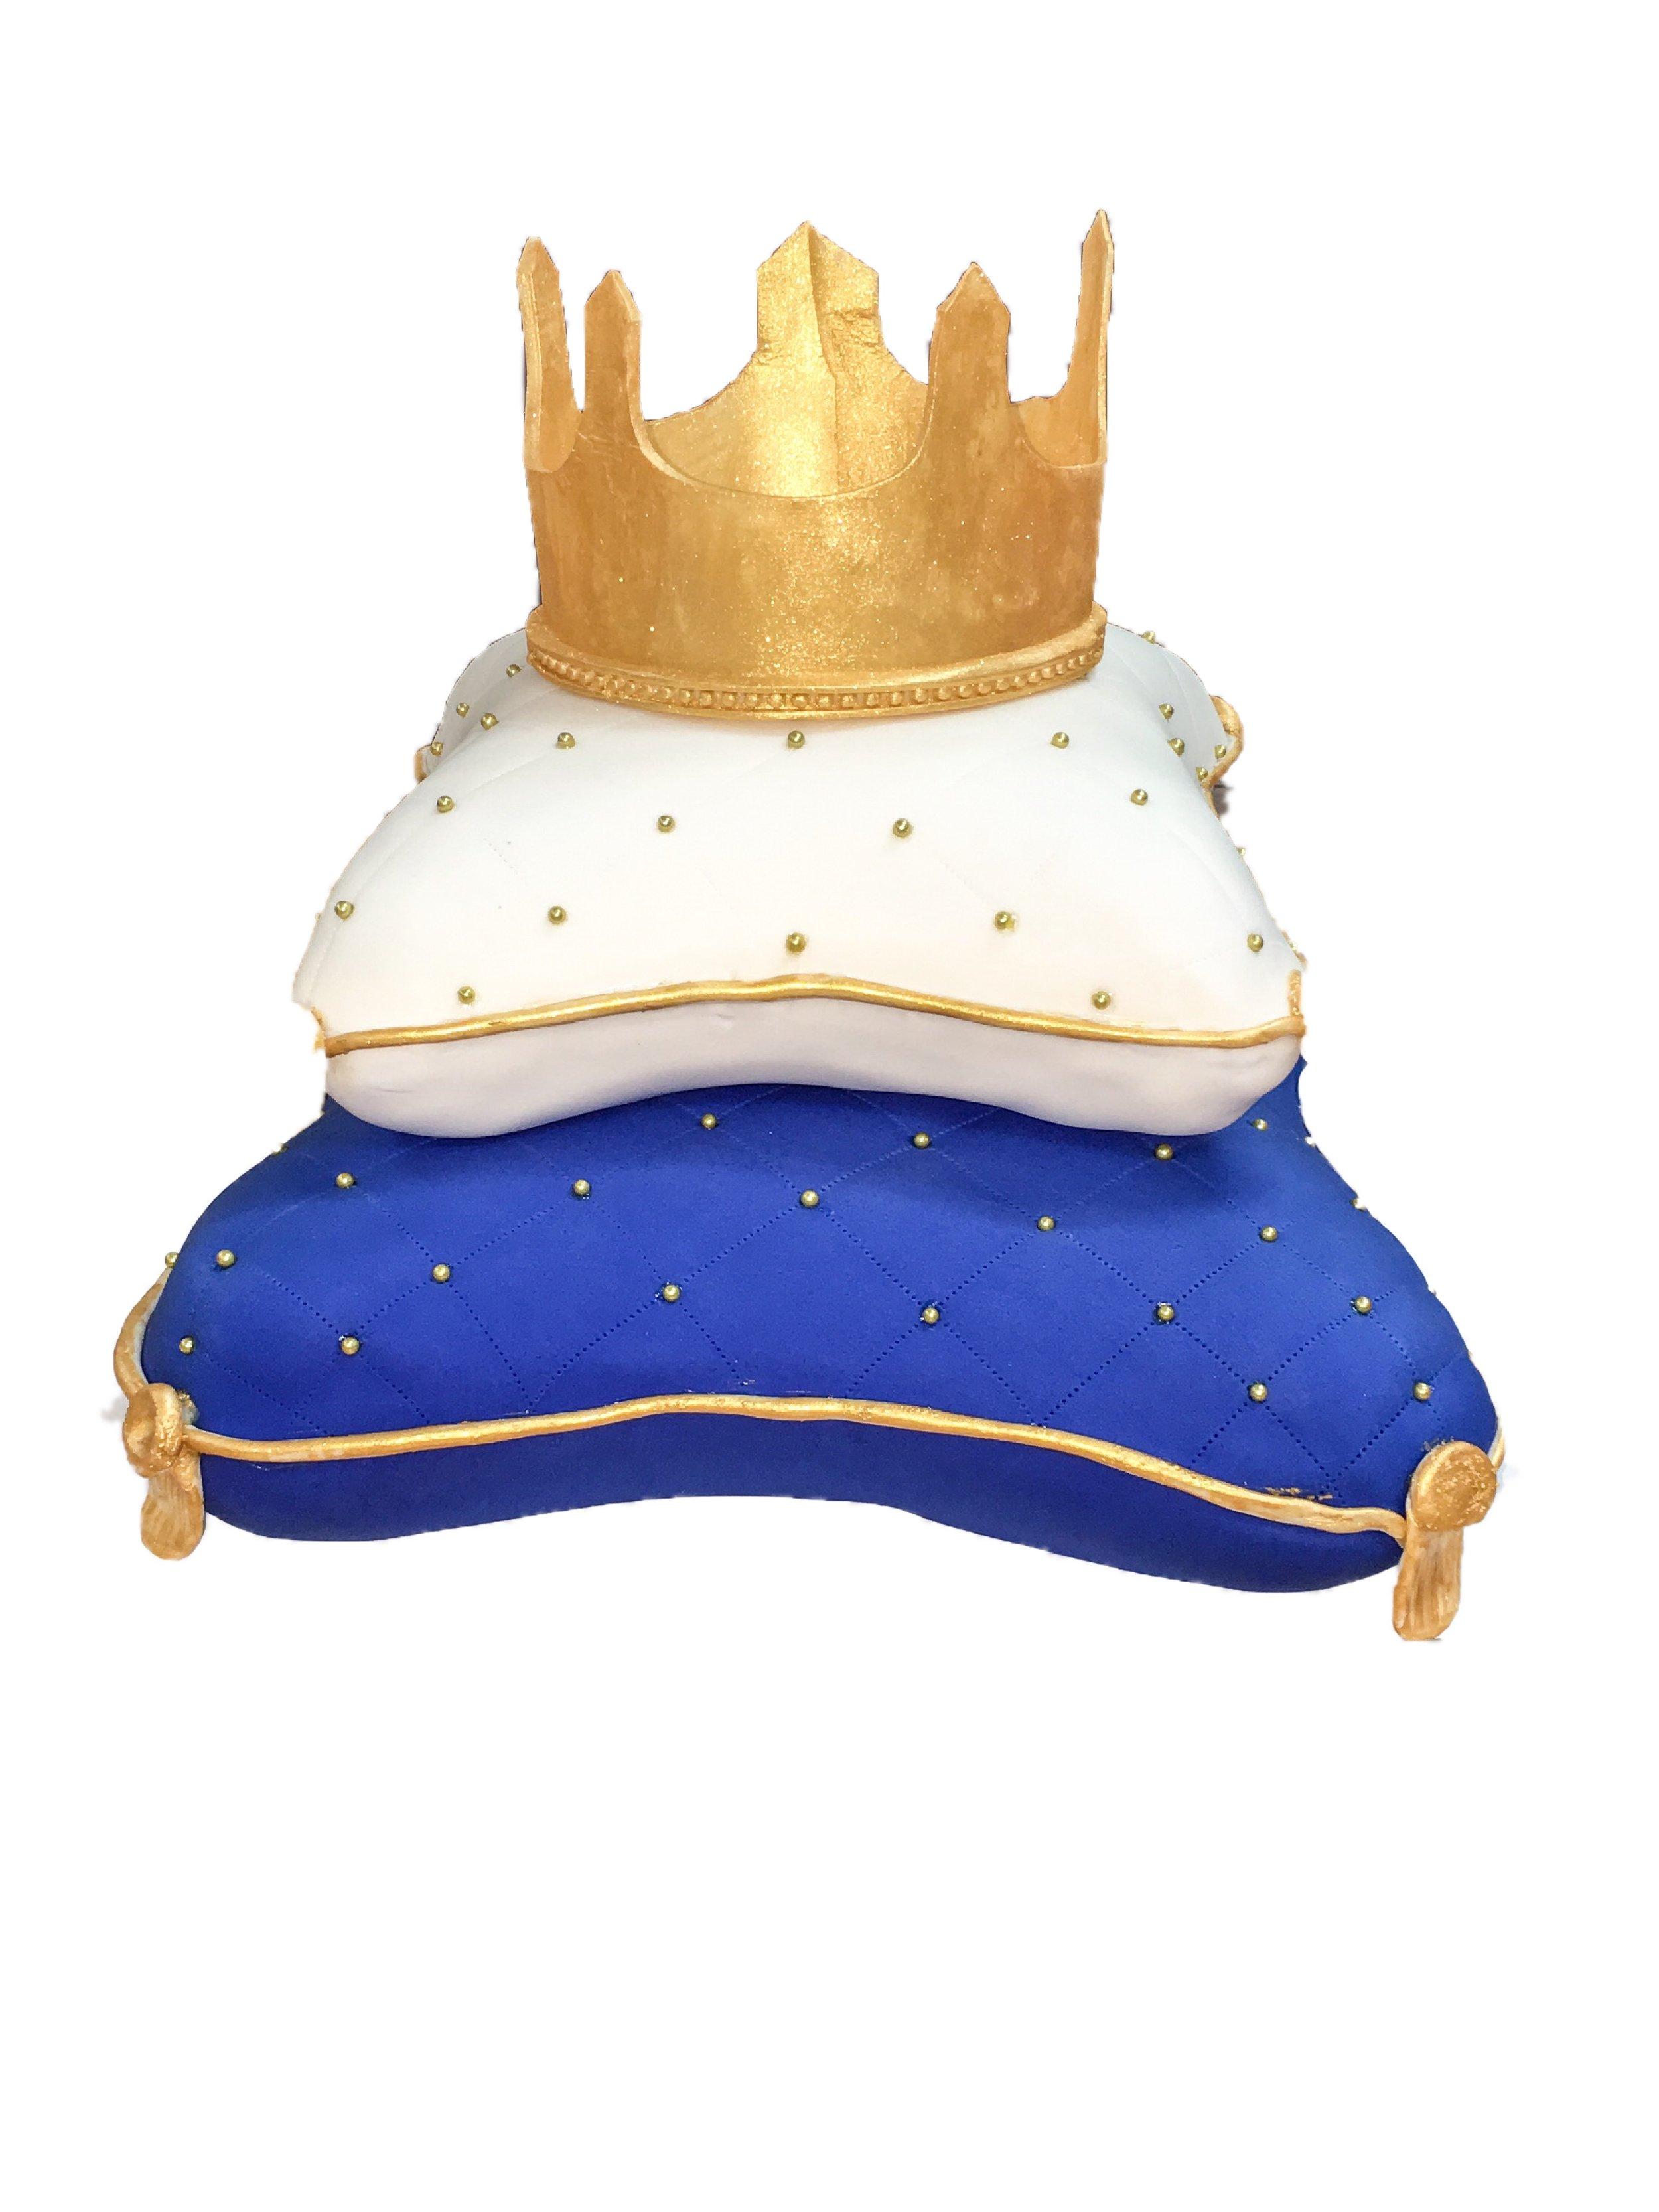 Prince Pillow Shower Cake